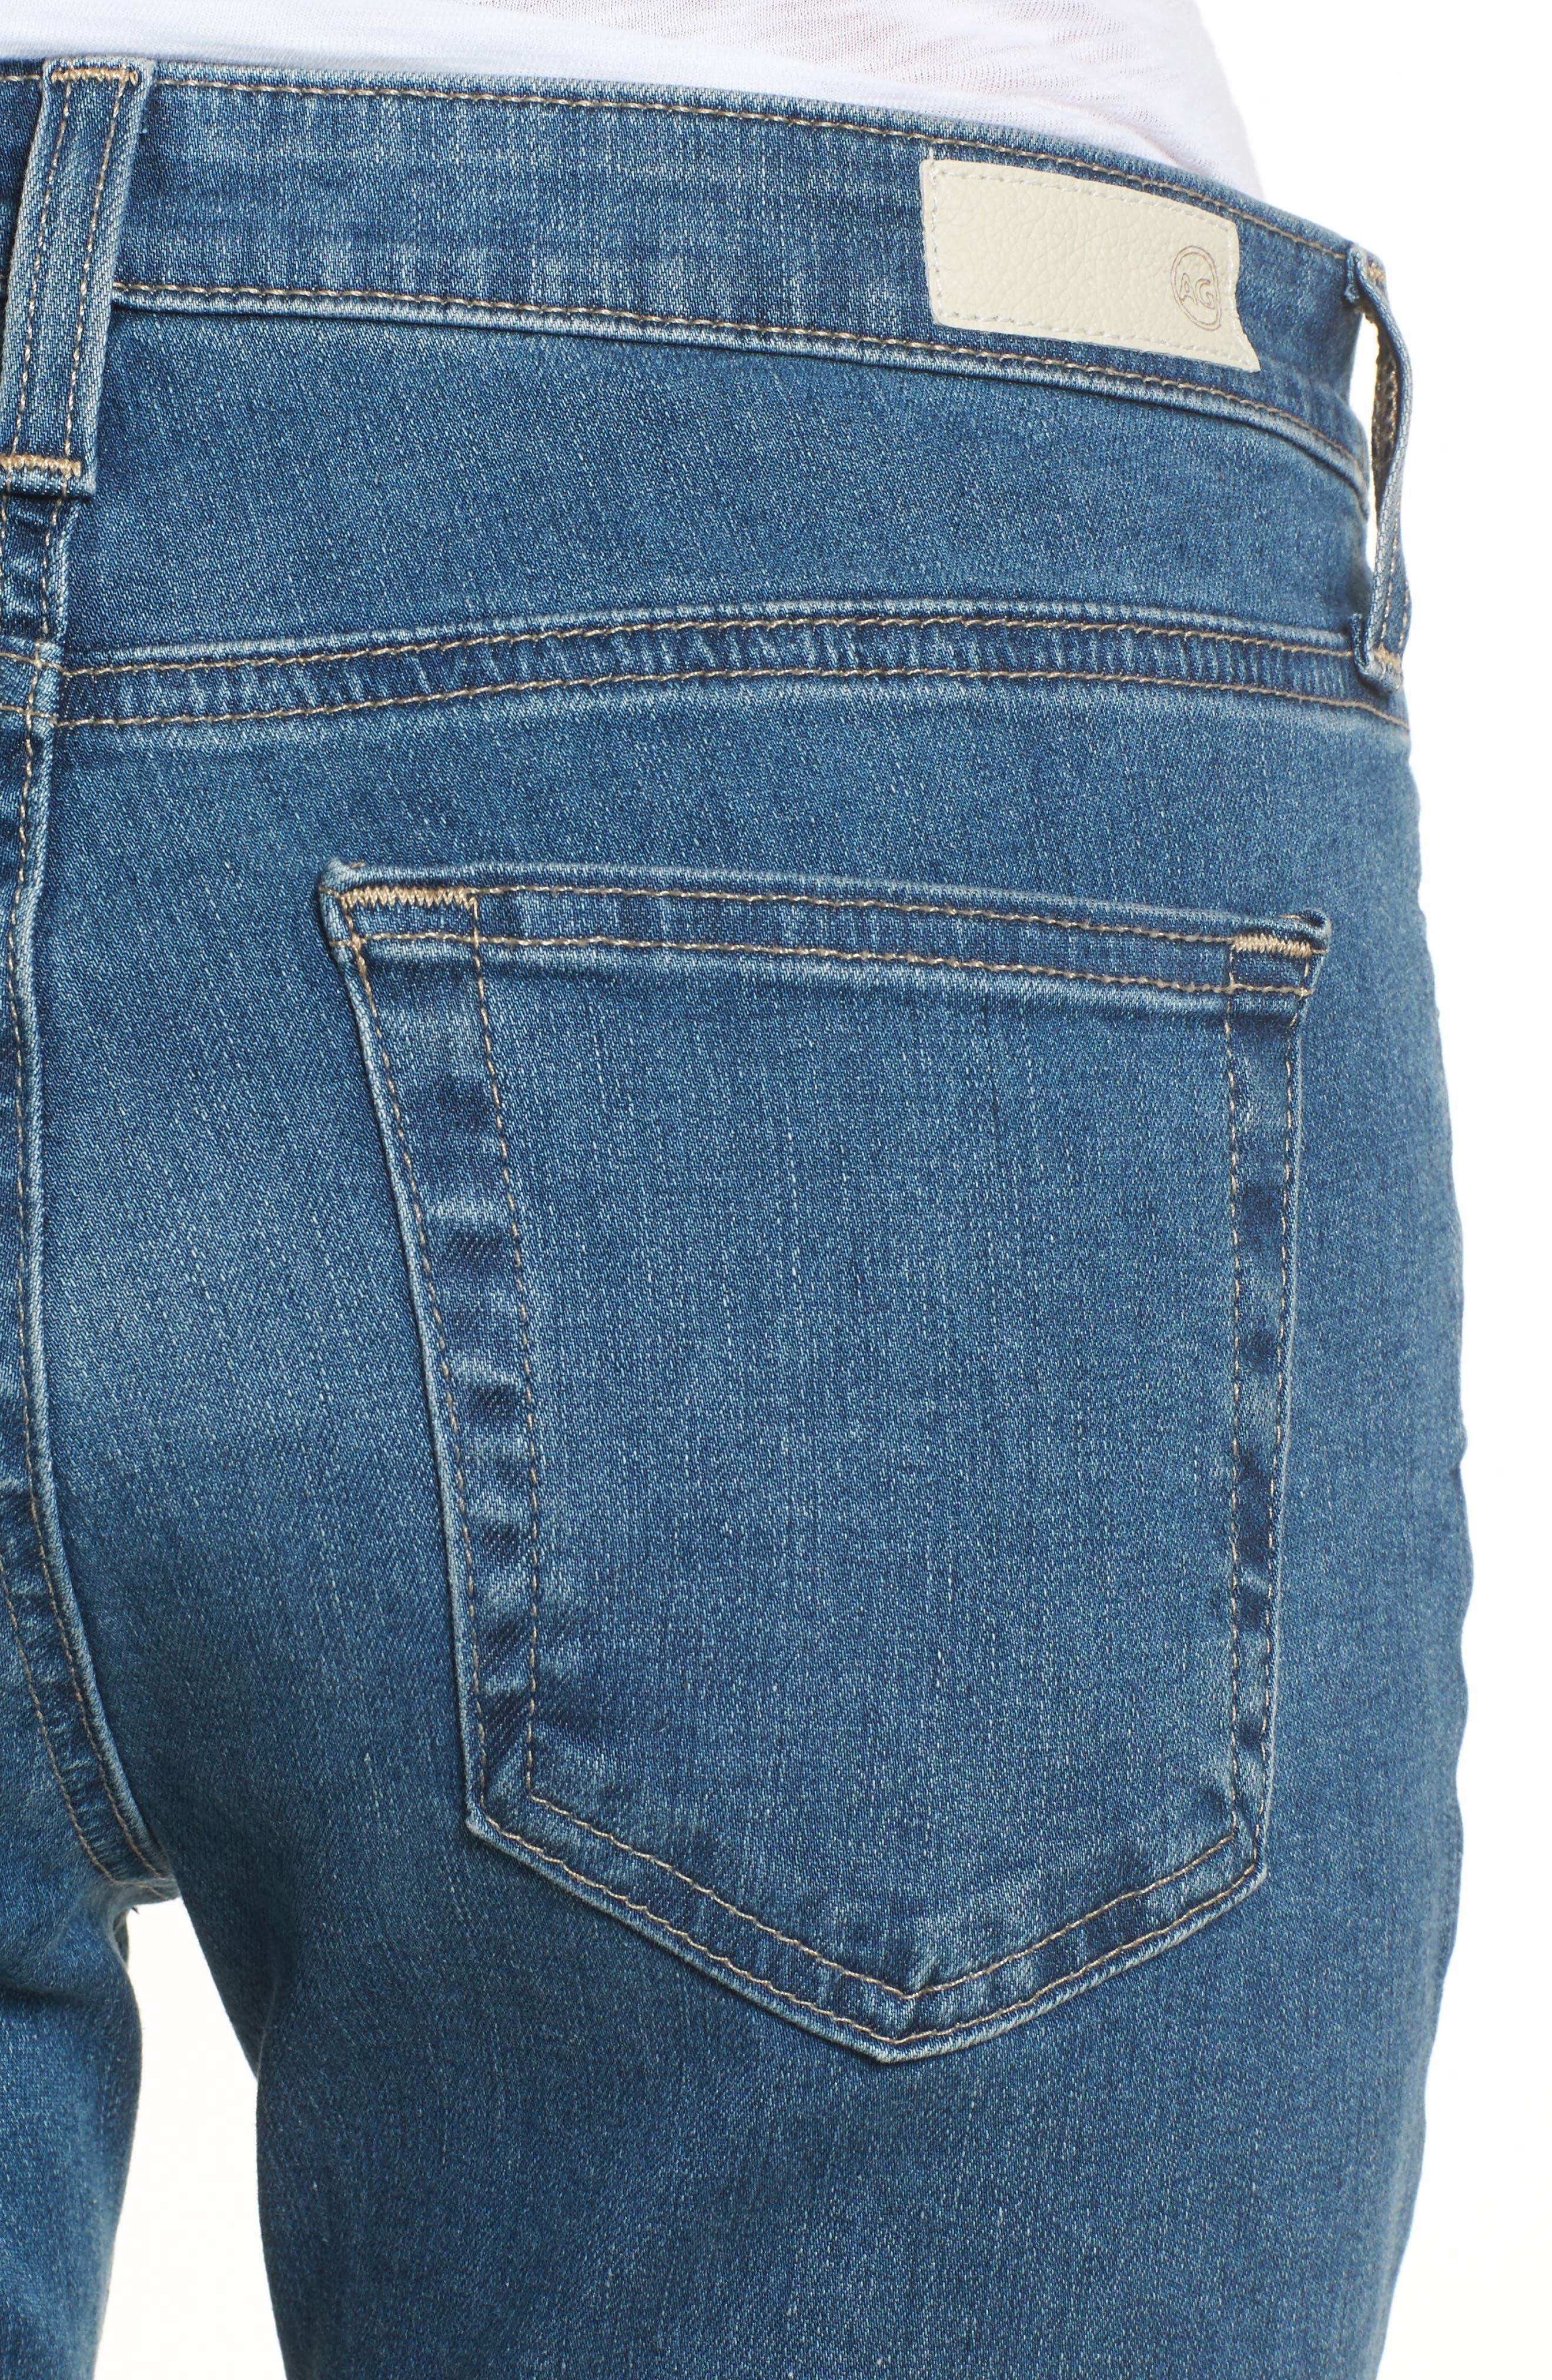 Alternate Image 4  - AG Jodi High Waist Crop Jeans (10 Years Sea Mist)